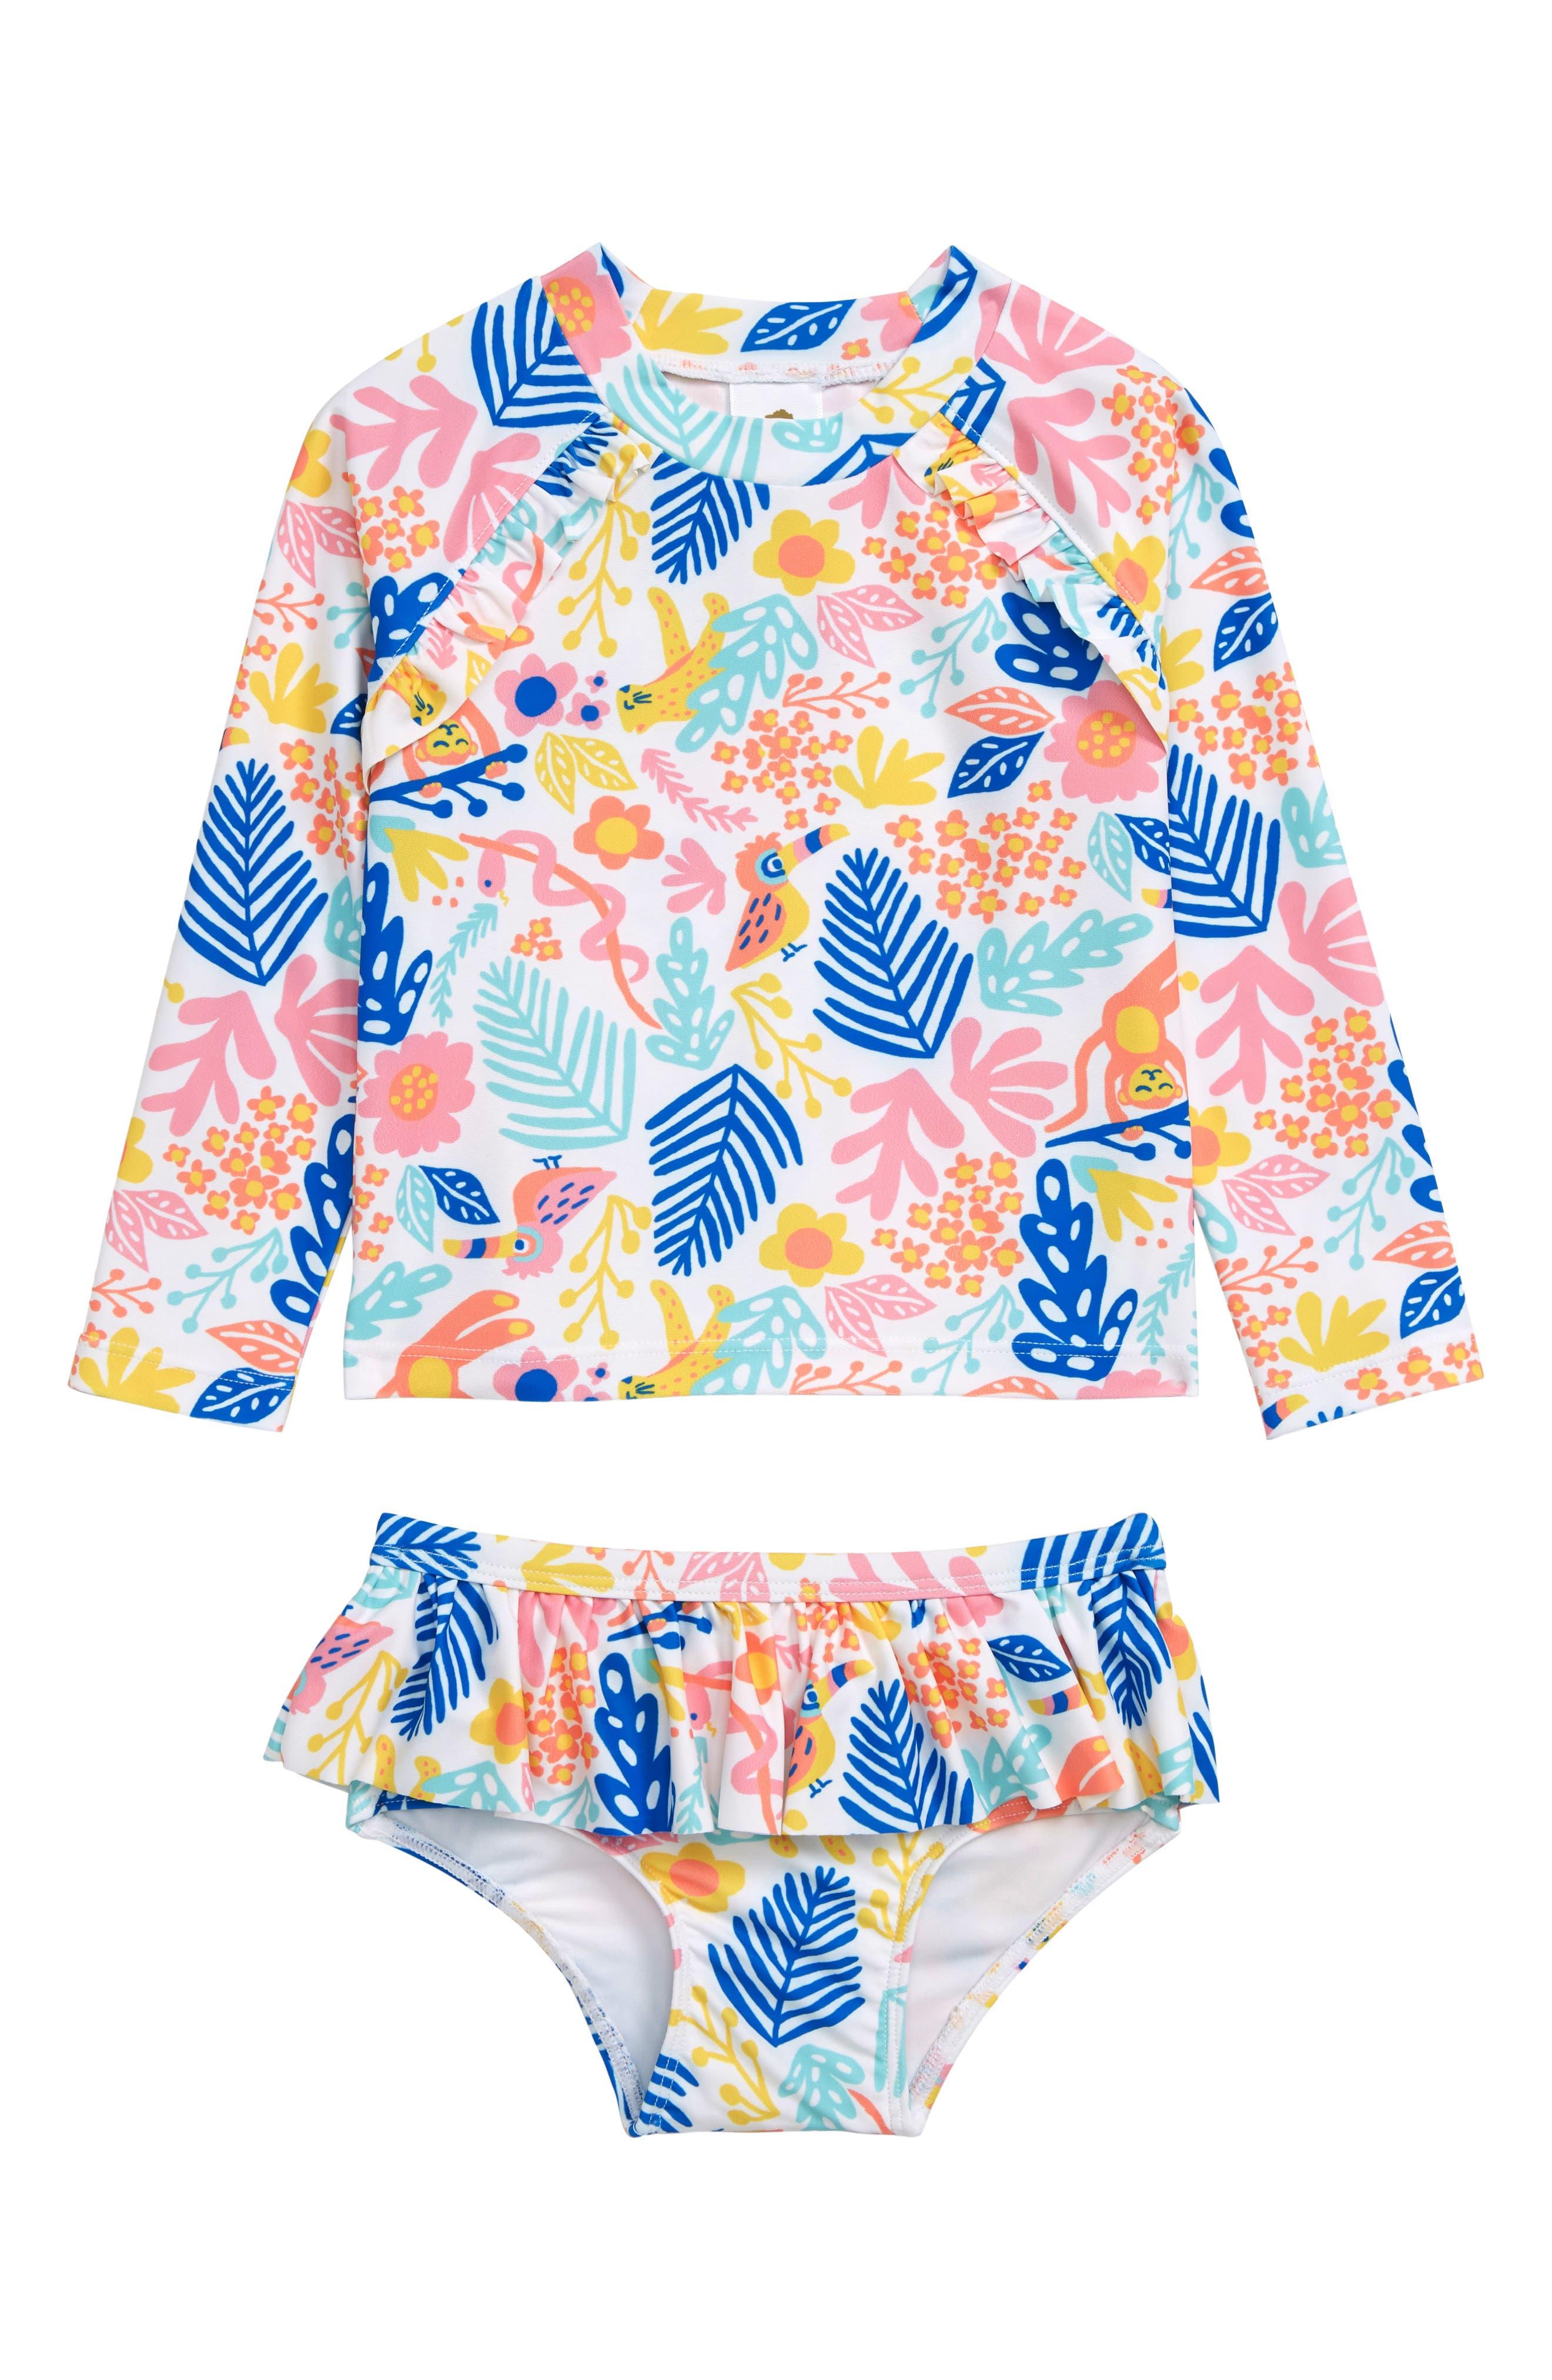 Two-Piece Ruffle Rashguard Swimsuit, Main, color, WHITE- PINK JUNGLE